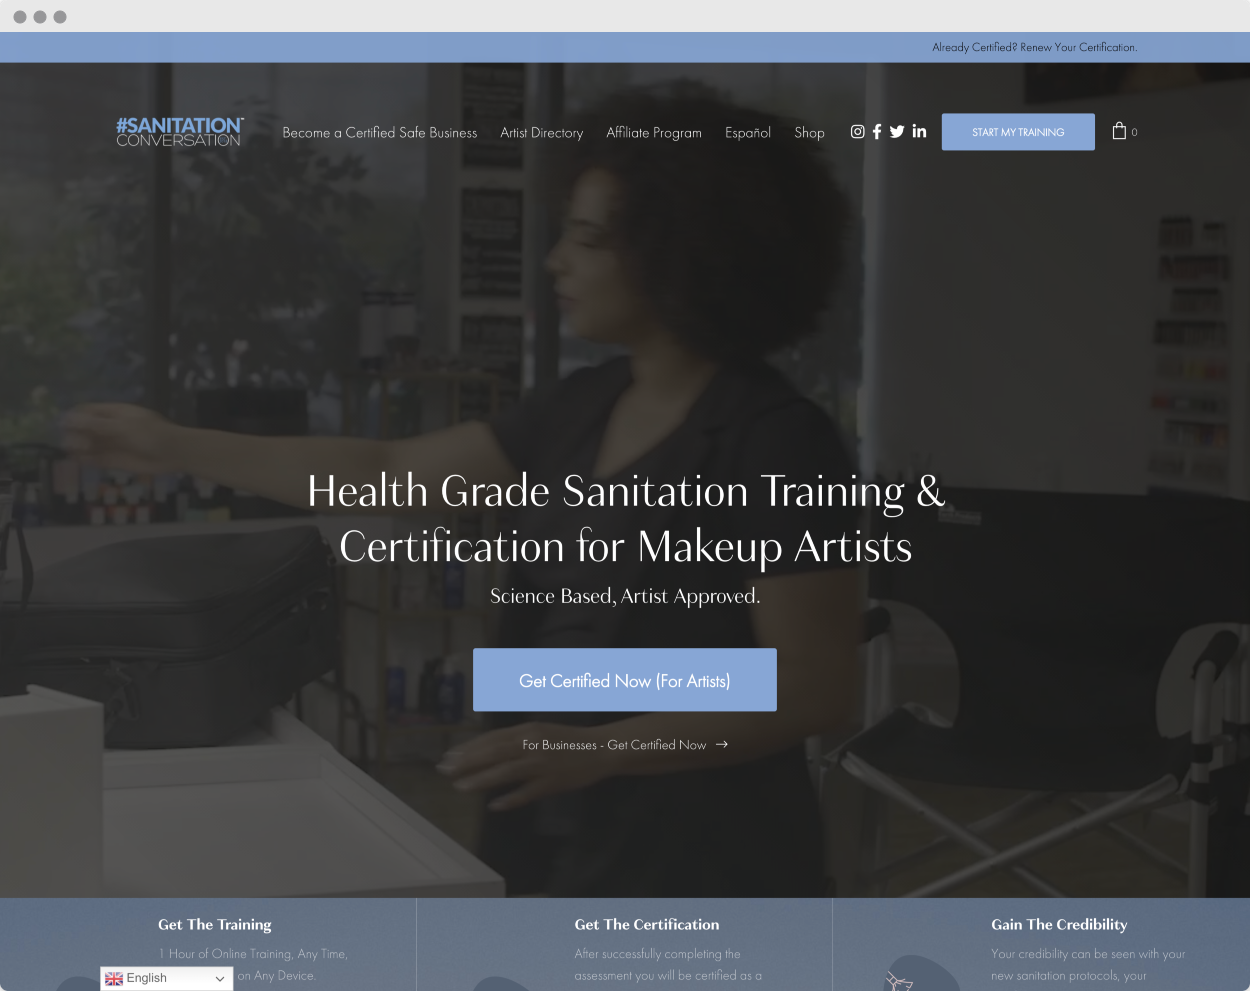 StoryBrand Website Example #9 –Sanitation Conversation